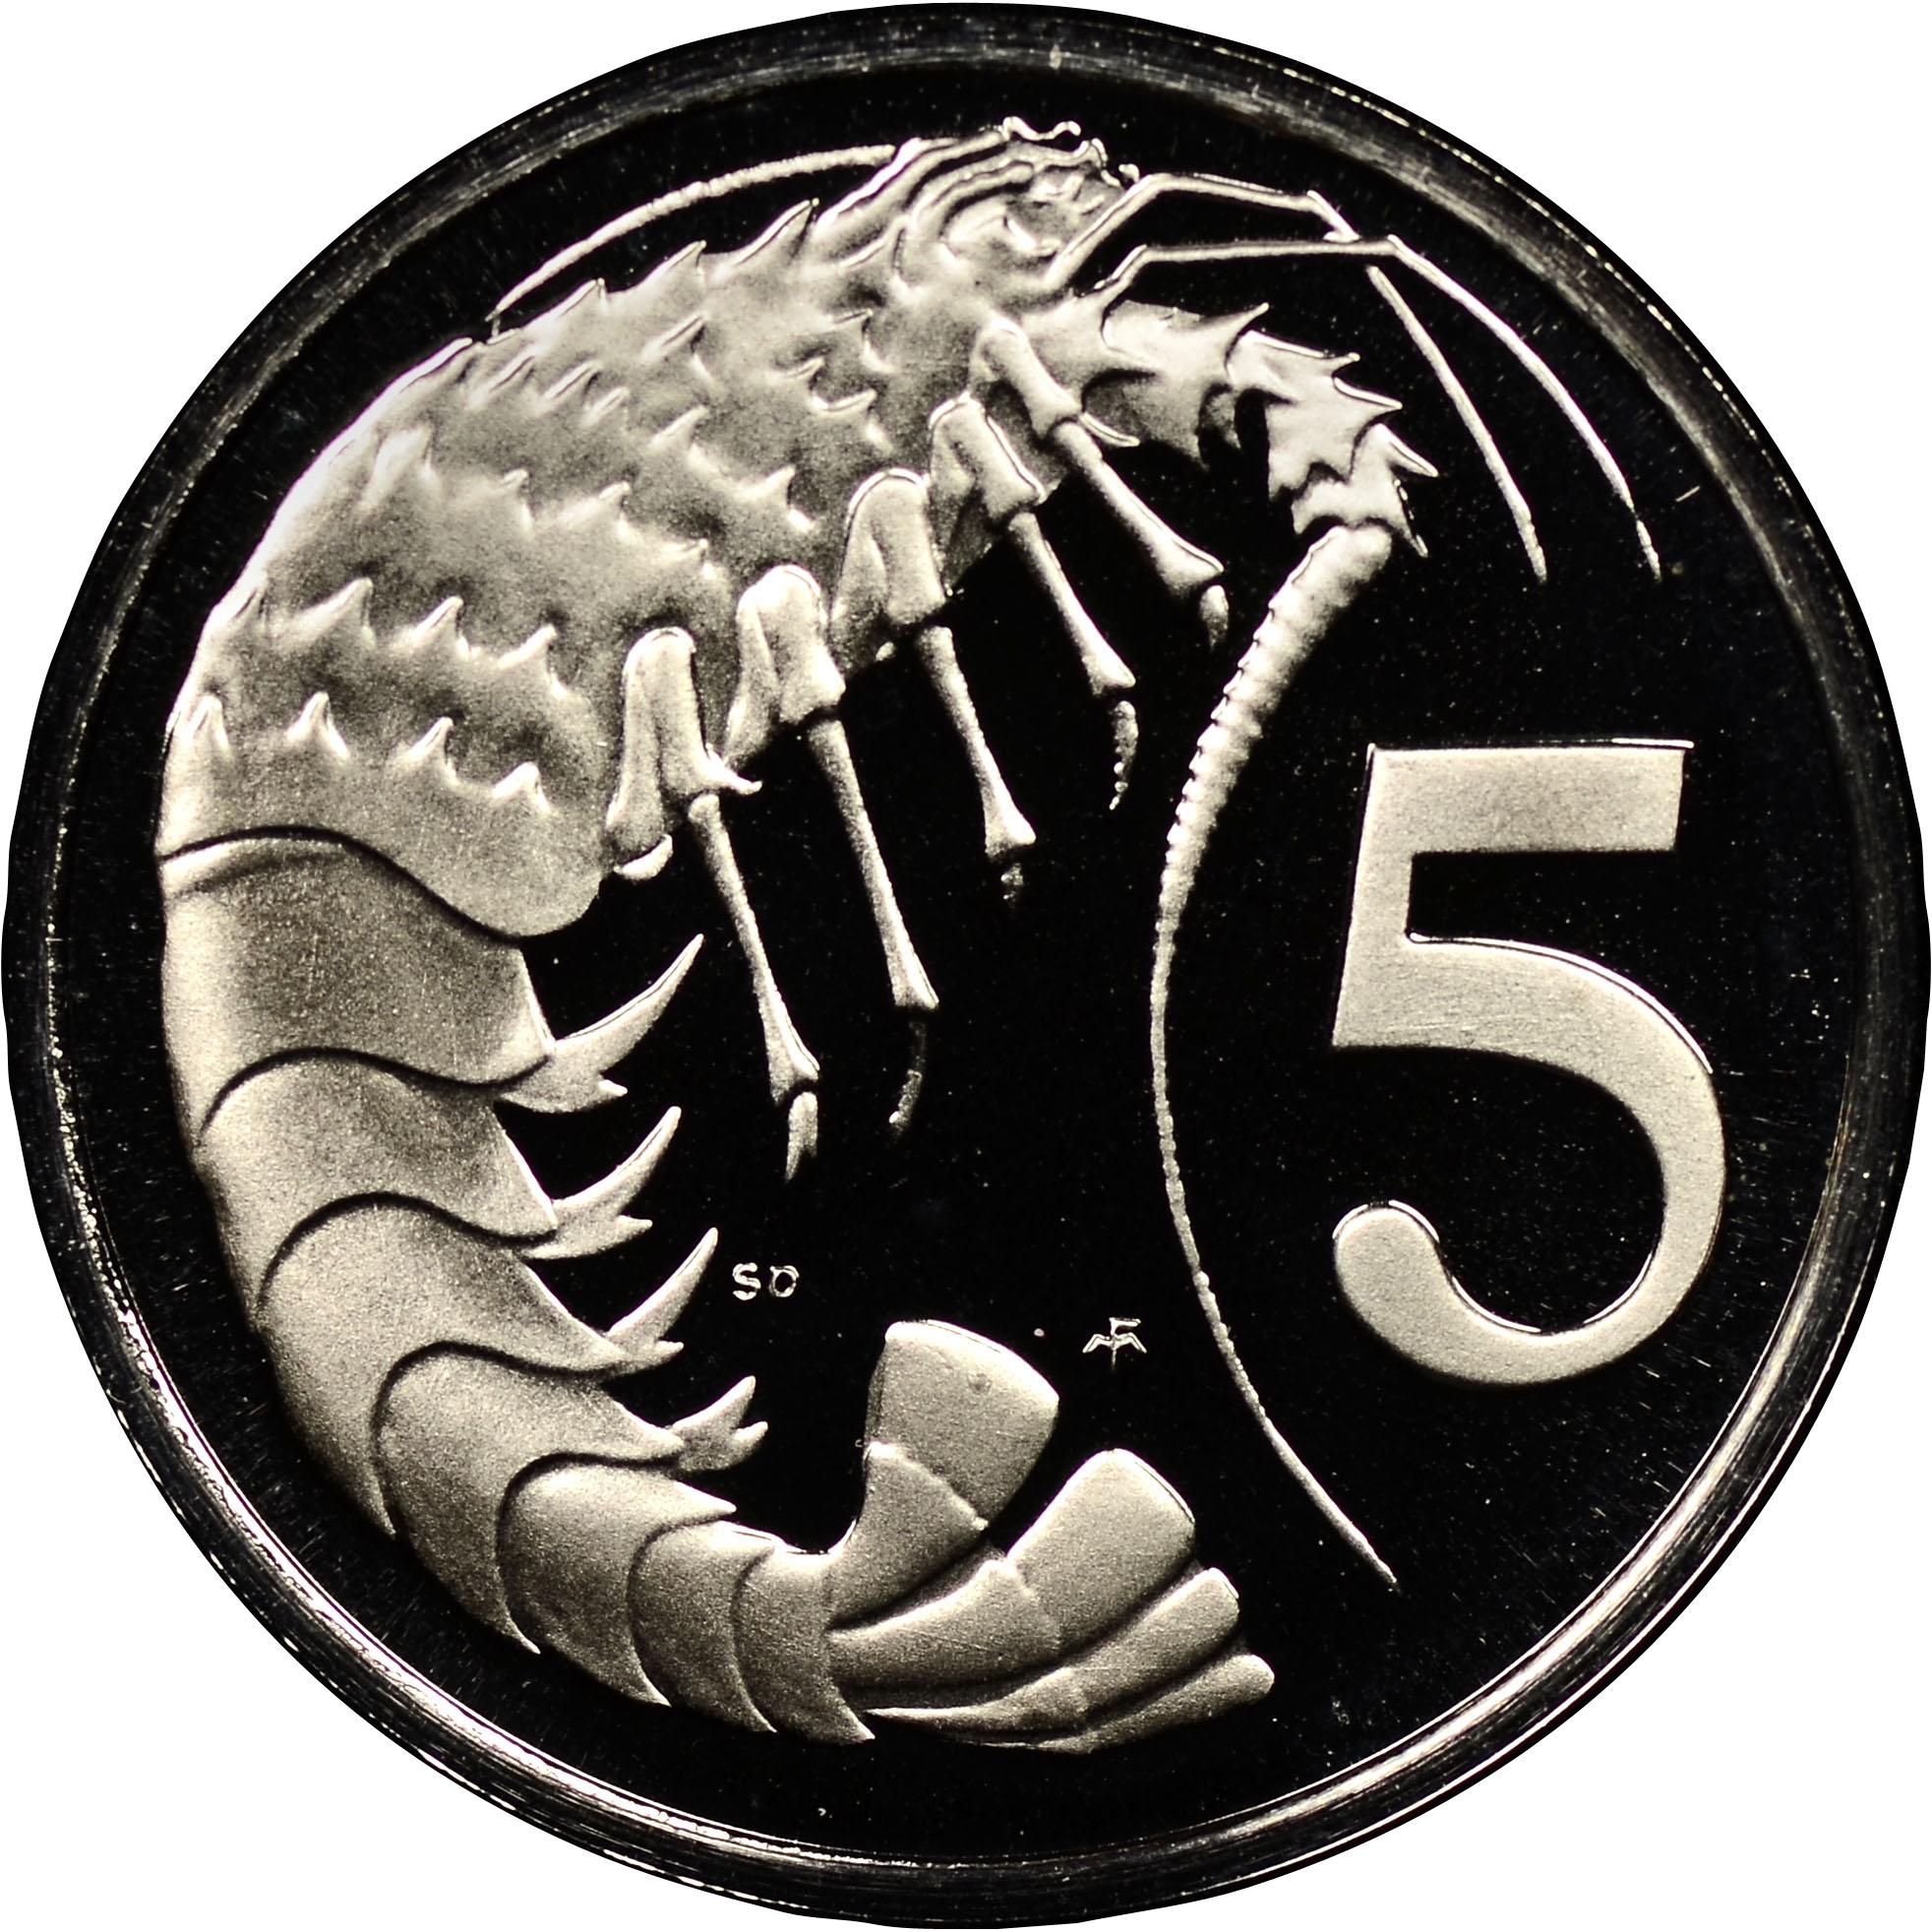 Cayman Islands 5 Cents reverse